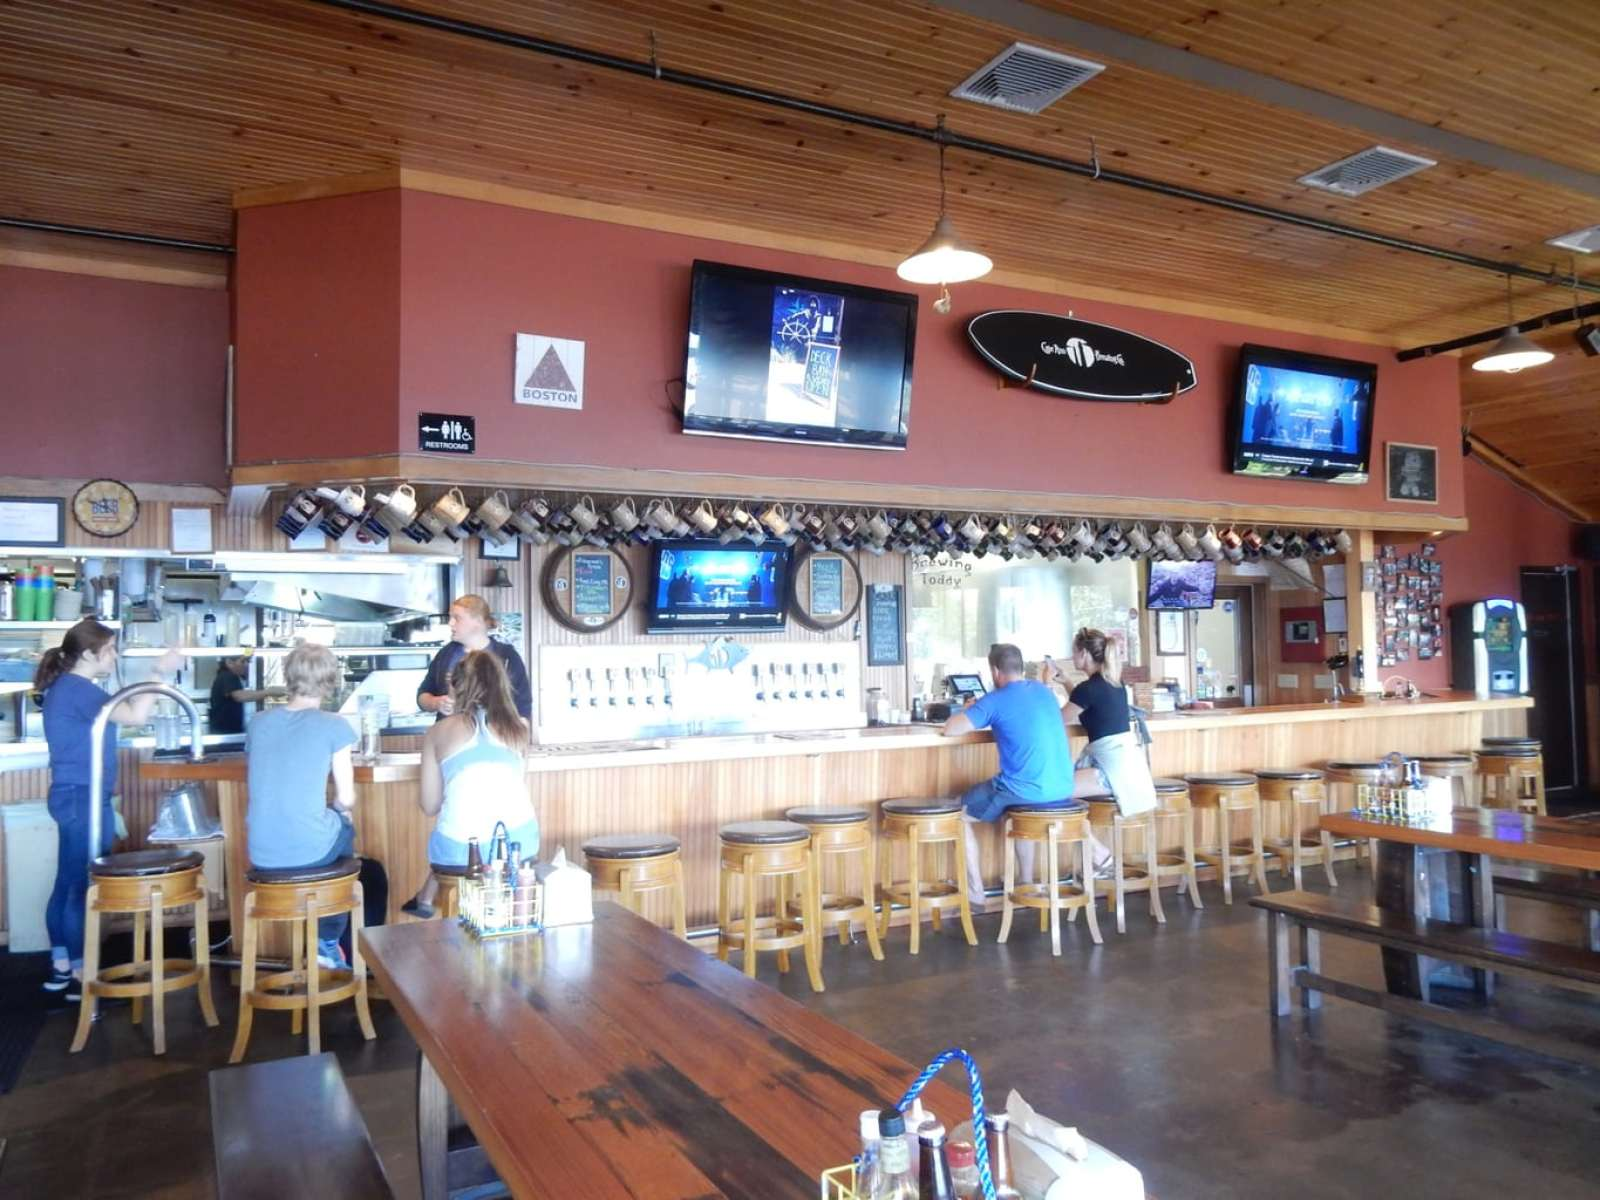 Cape Ann Brewing Co. Gloucester MA